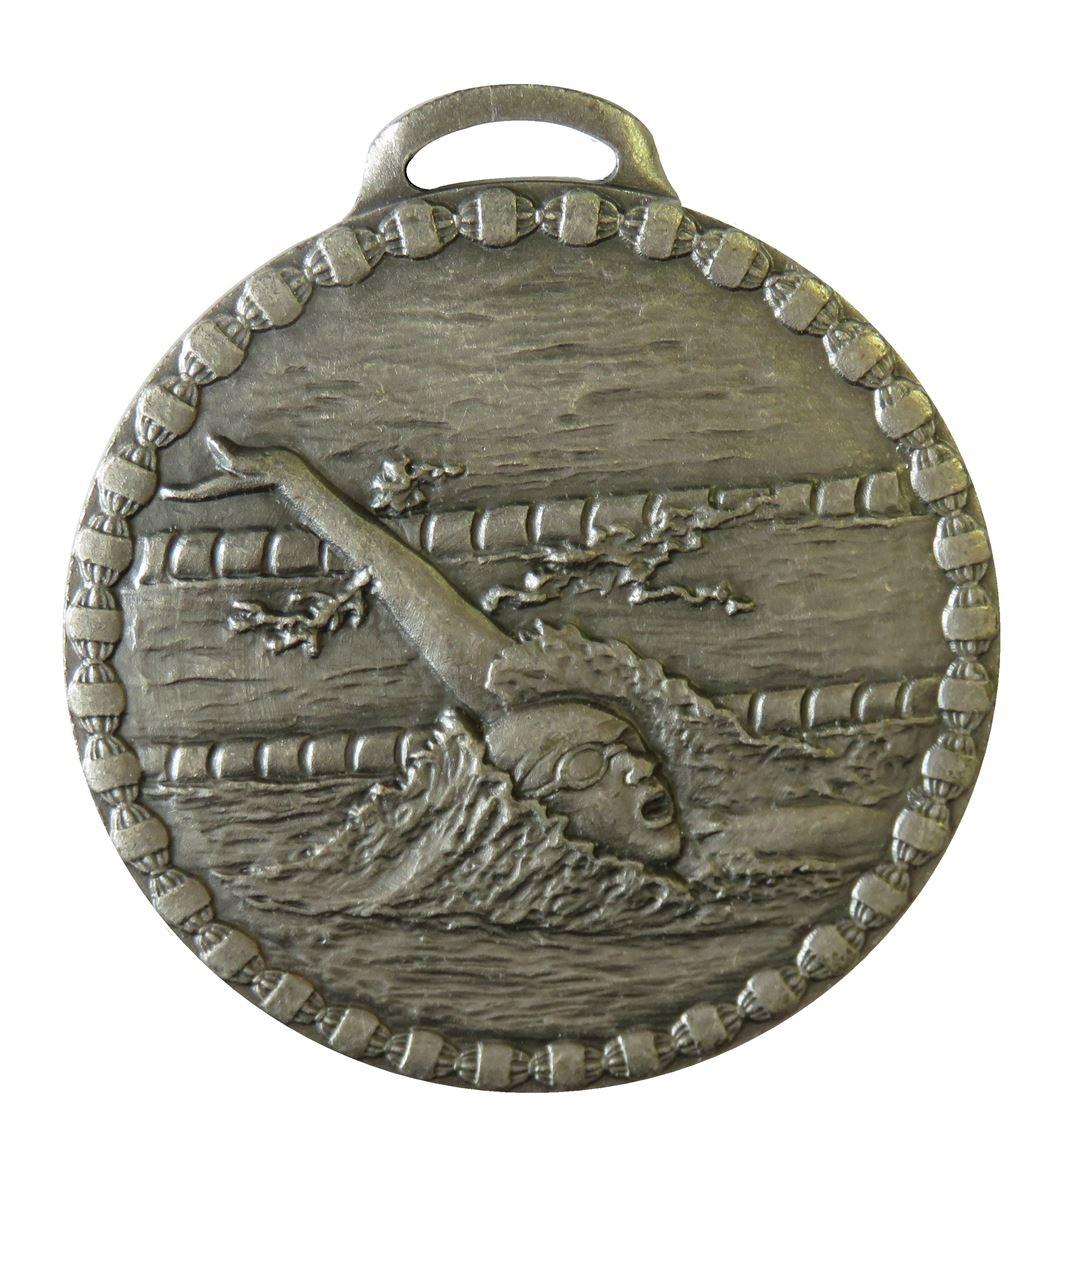 Silver Female Back Stroke Value Swimming Medal (size: 50mm) - 675E